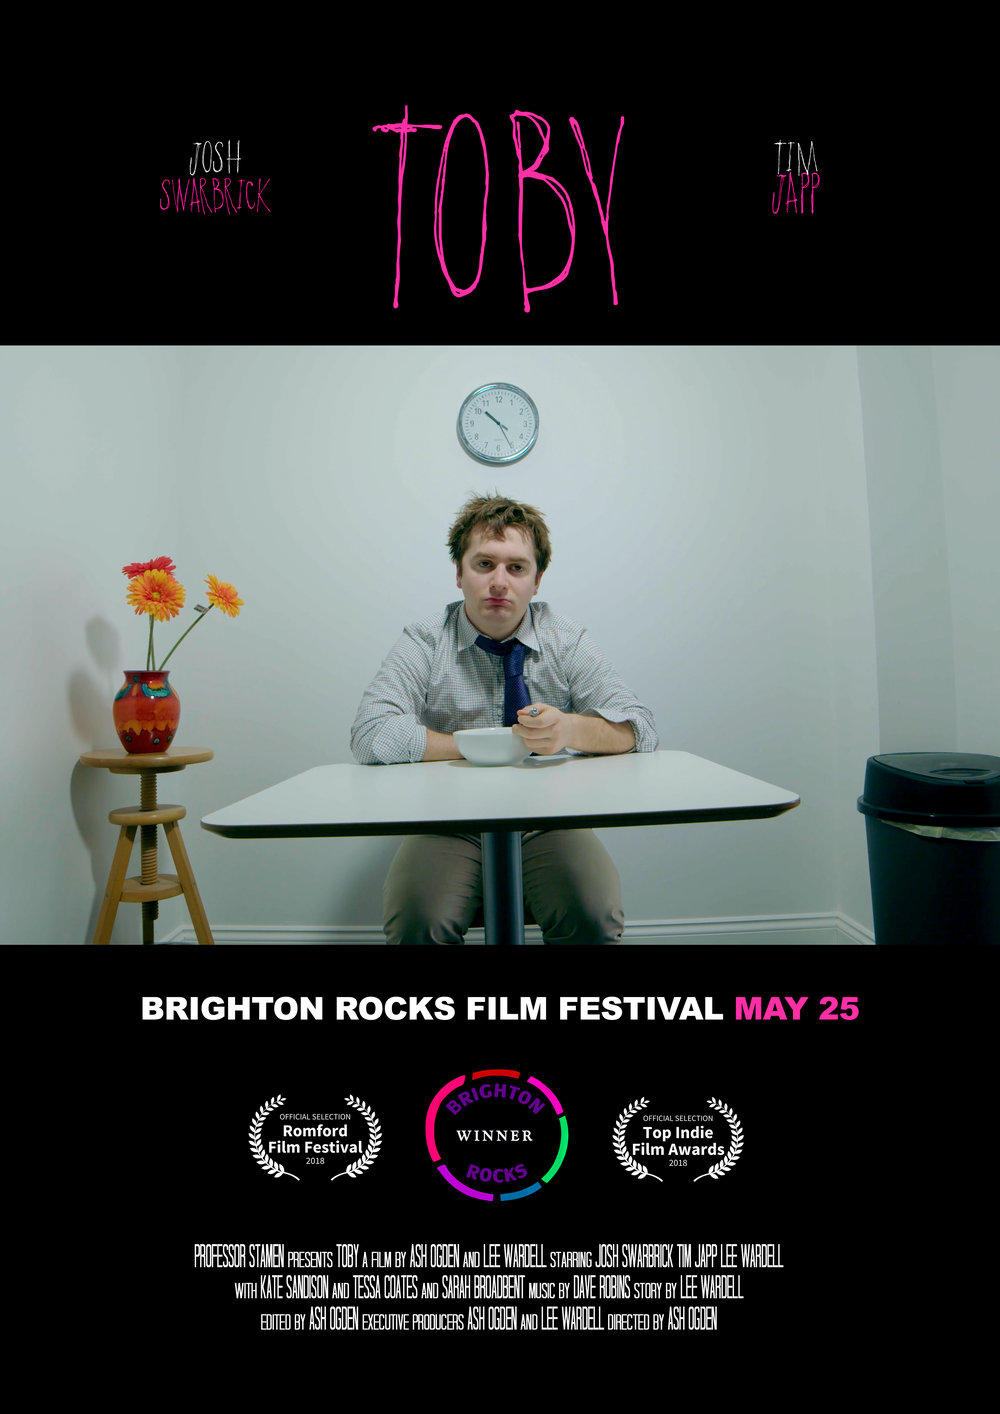 Toby Poster (Brighton + Breakfast).jpg